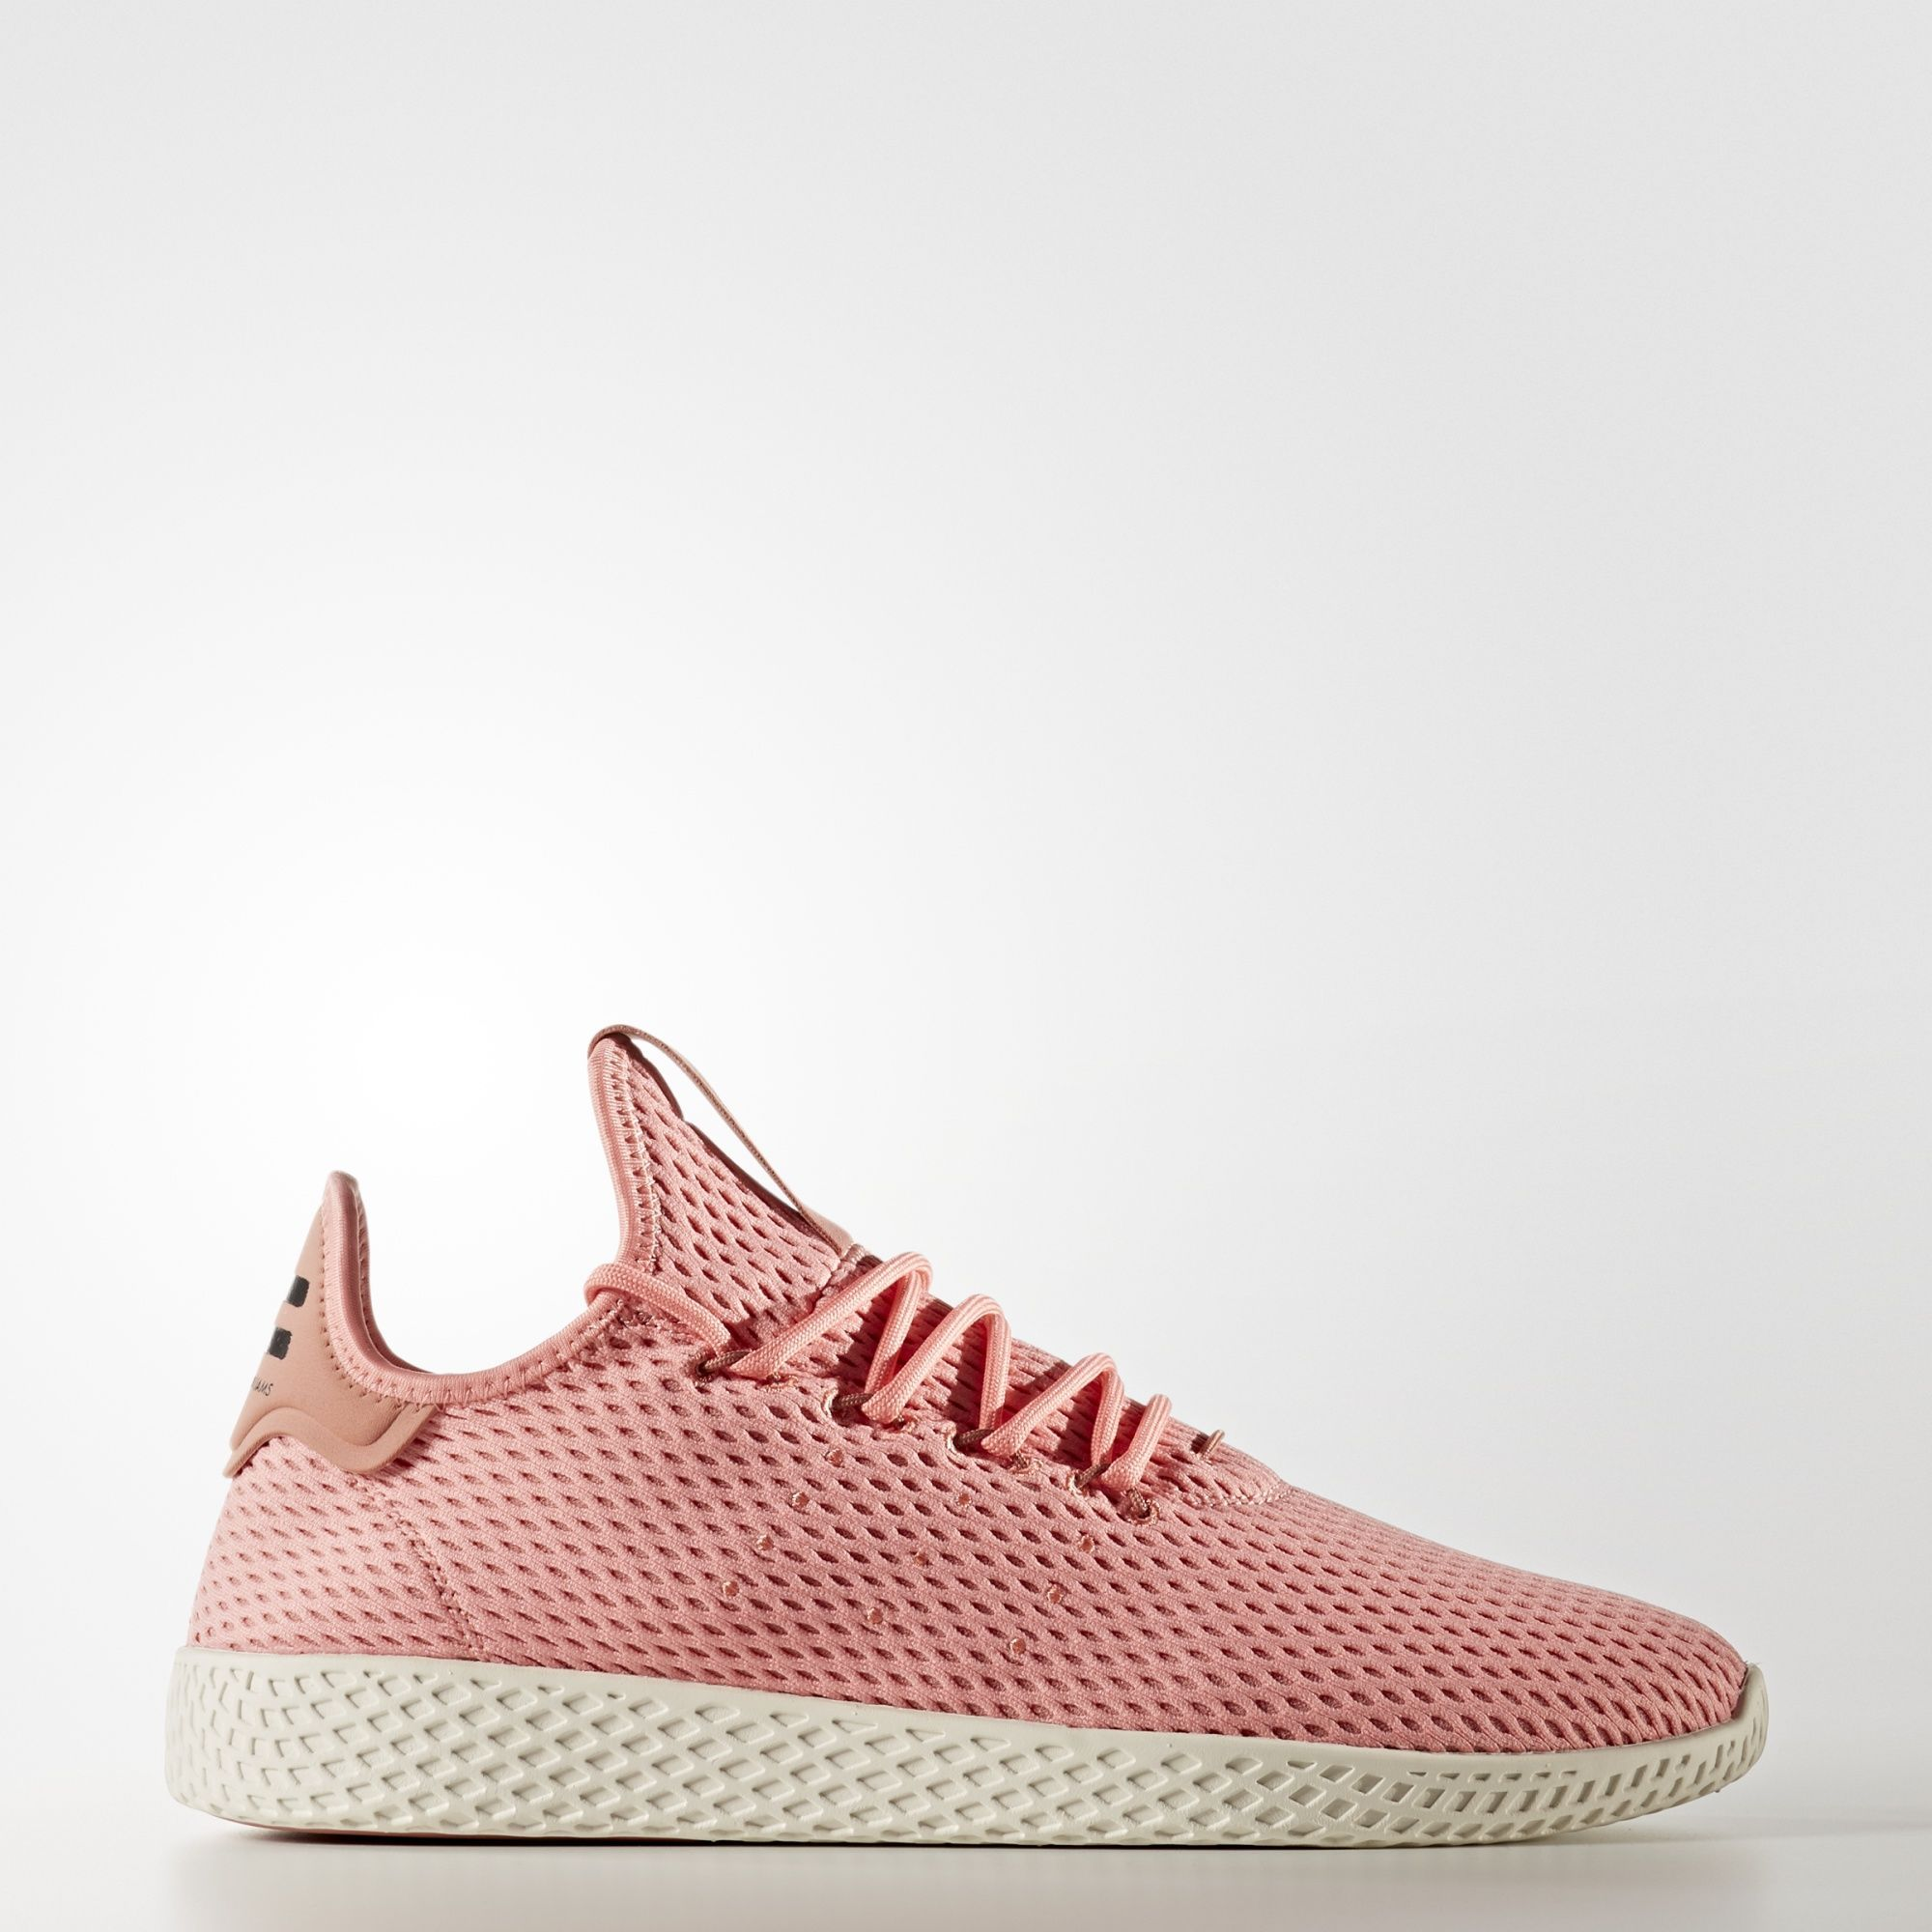 Adidas Pharrell Williams Tennis Hu Shoes Turnschuhe Damen Sneaker Pharrell Williams